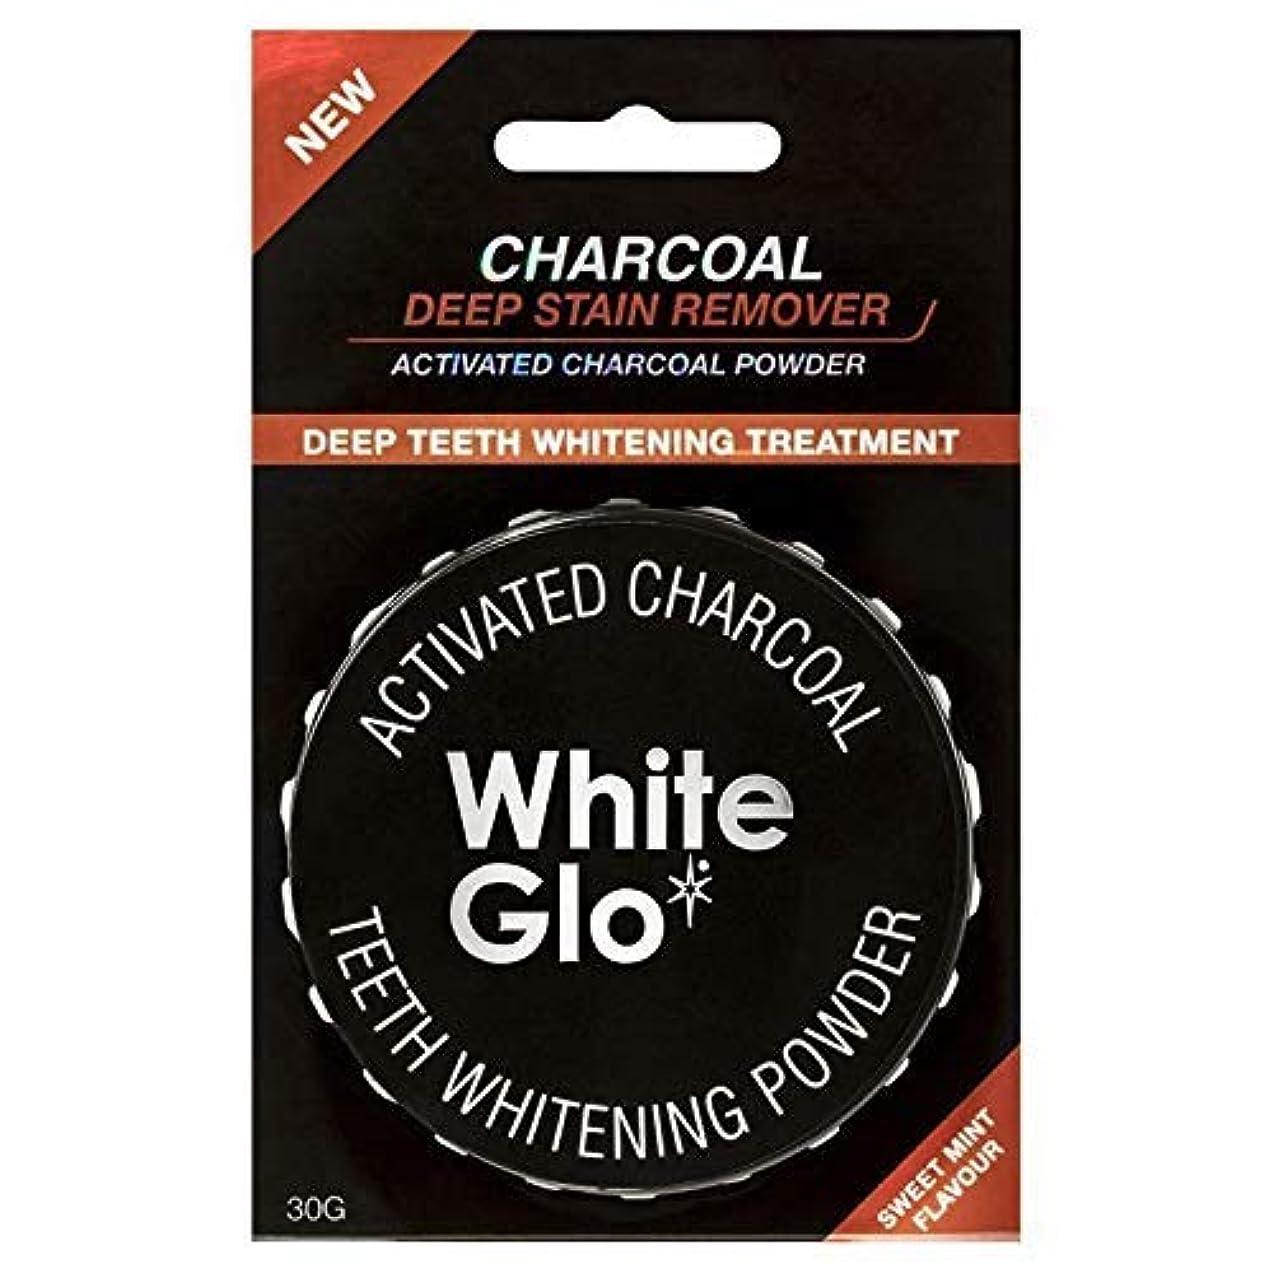 Teeth Whitening Systems White Glo Activated Charcoal Teeth Whitening Powder 30g Australia / システムを白くする歯を白くする歯の粉...